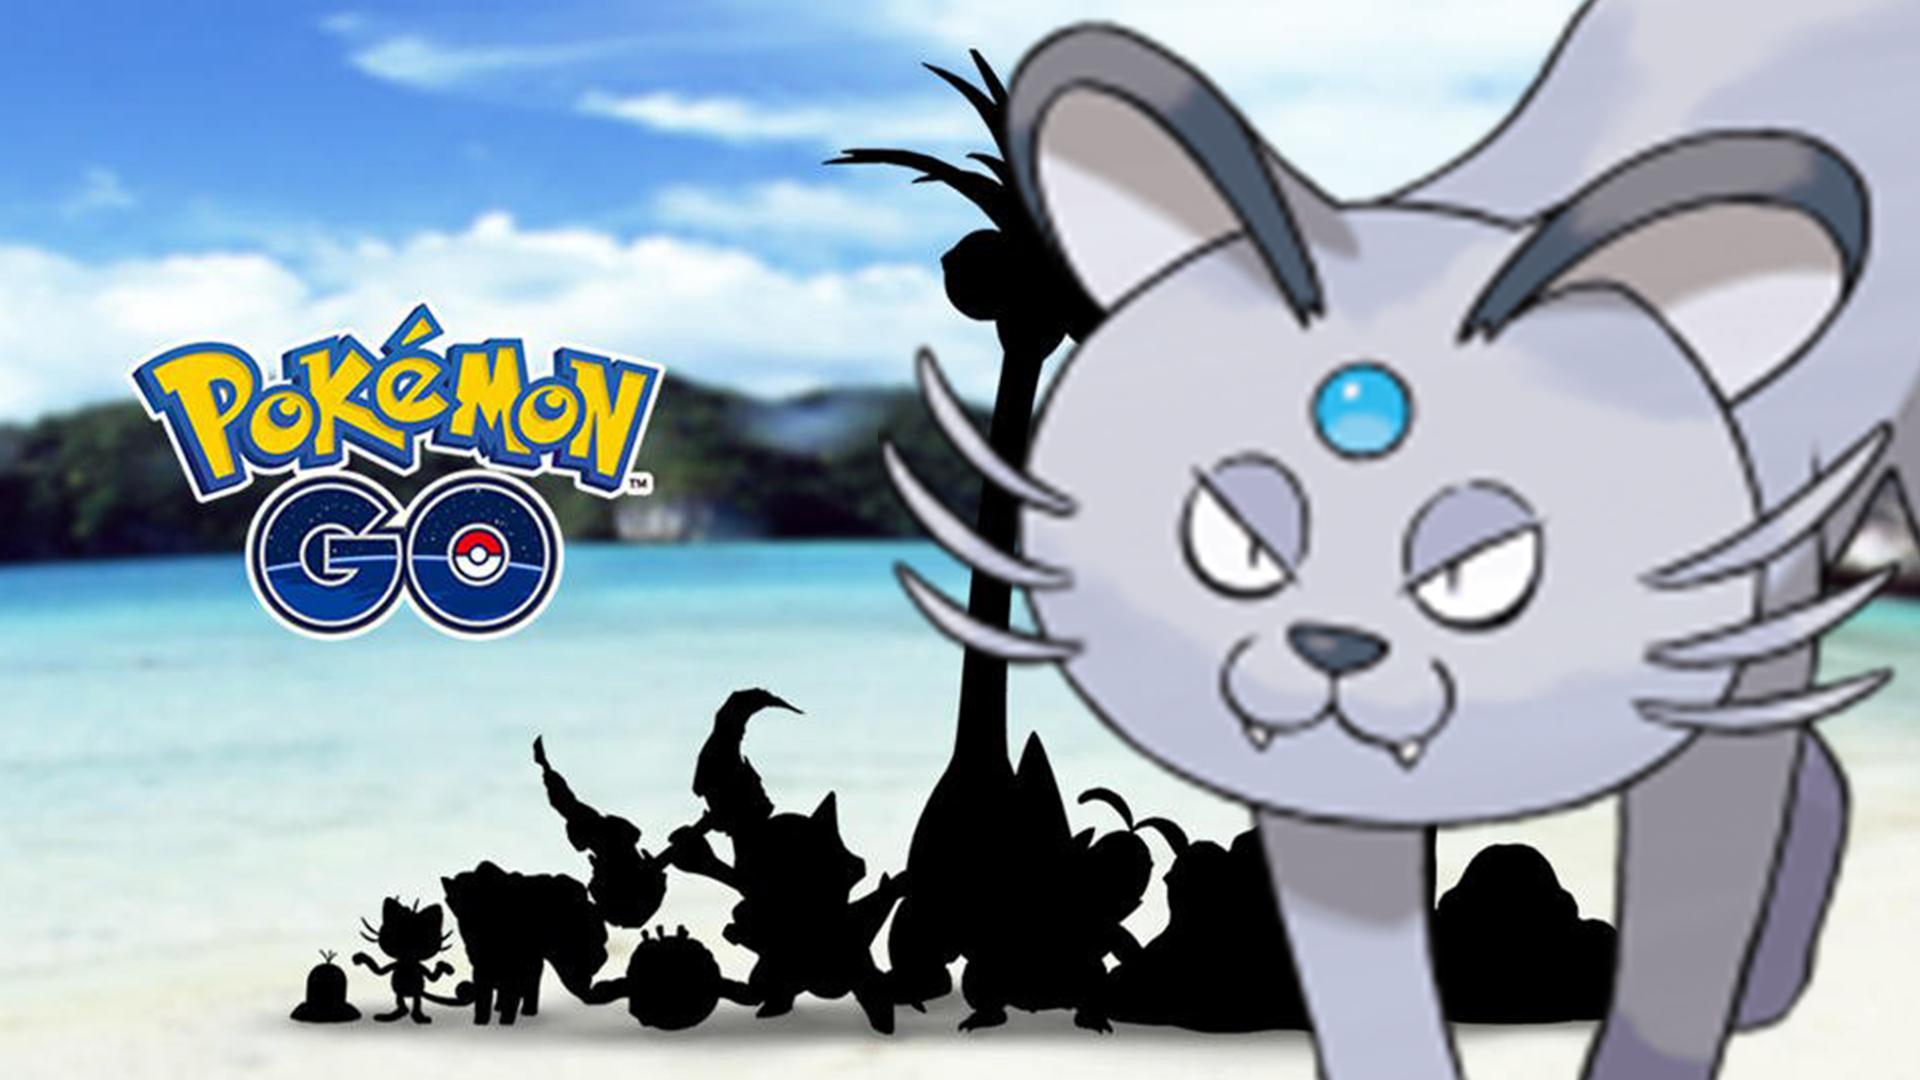 Pokemon GO will be getting Alolan forms of gen 1 Pokemon screenshot